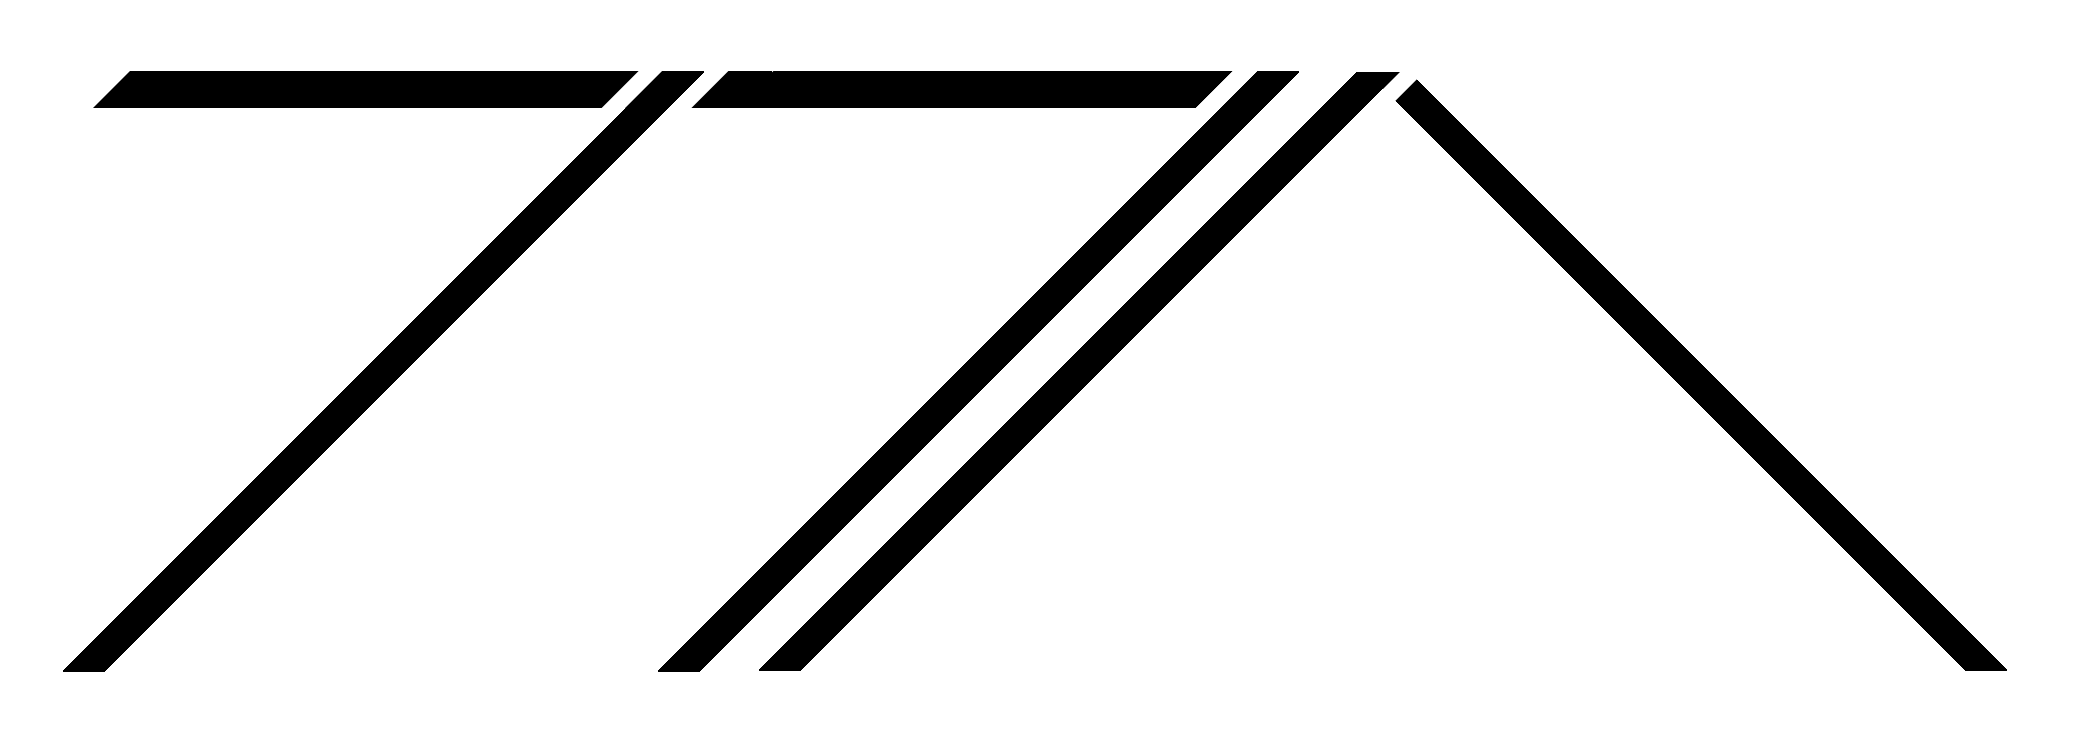 77Arch